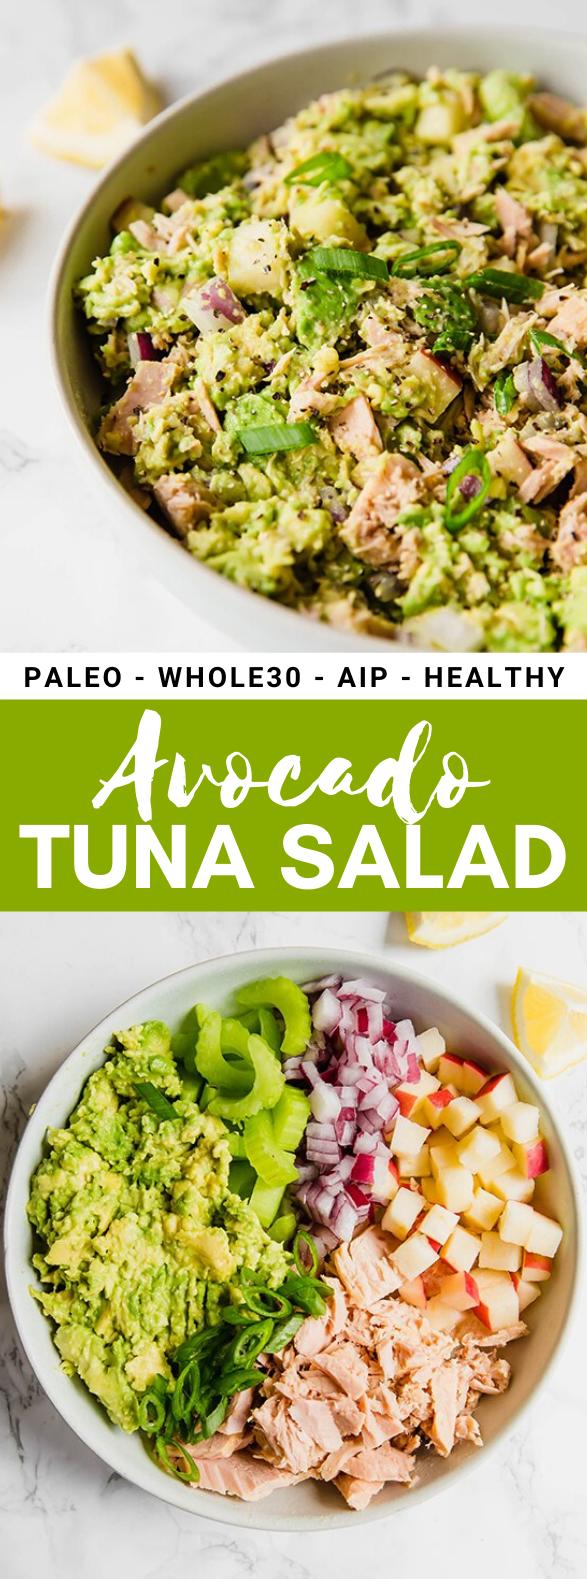 AVOCADO TUNA SALAD (PALEO, WHOLE30, AIP) #healthy #diet